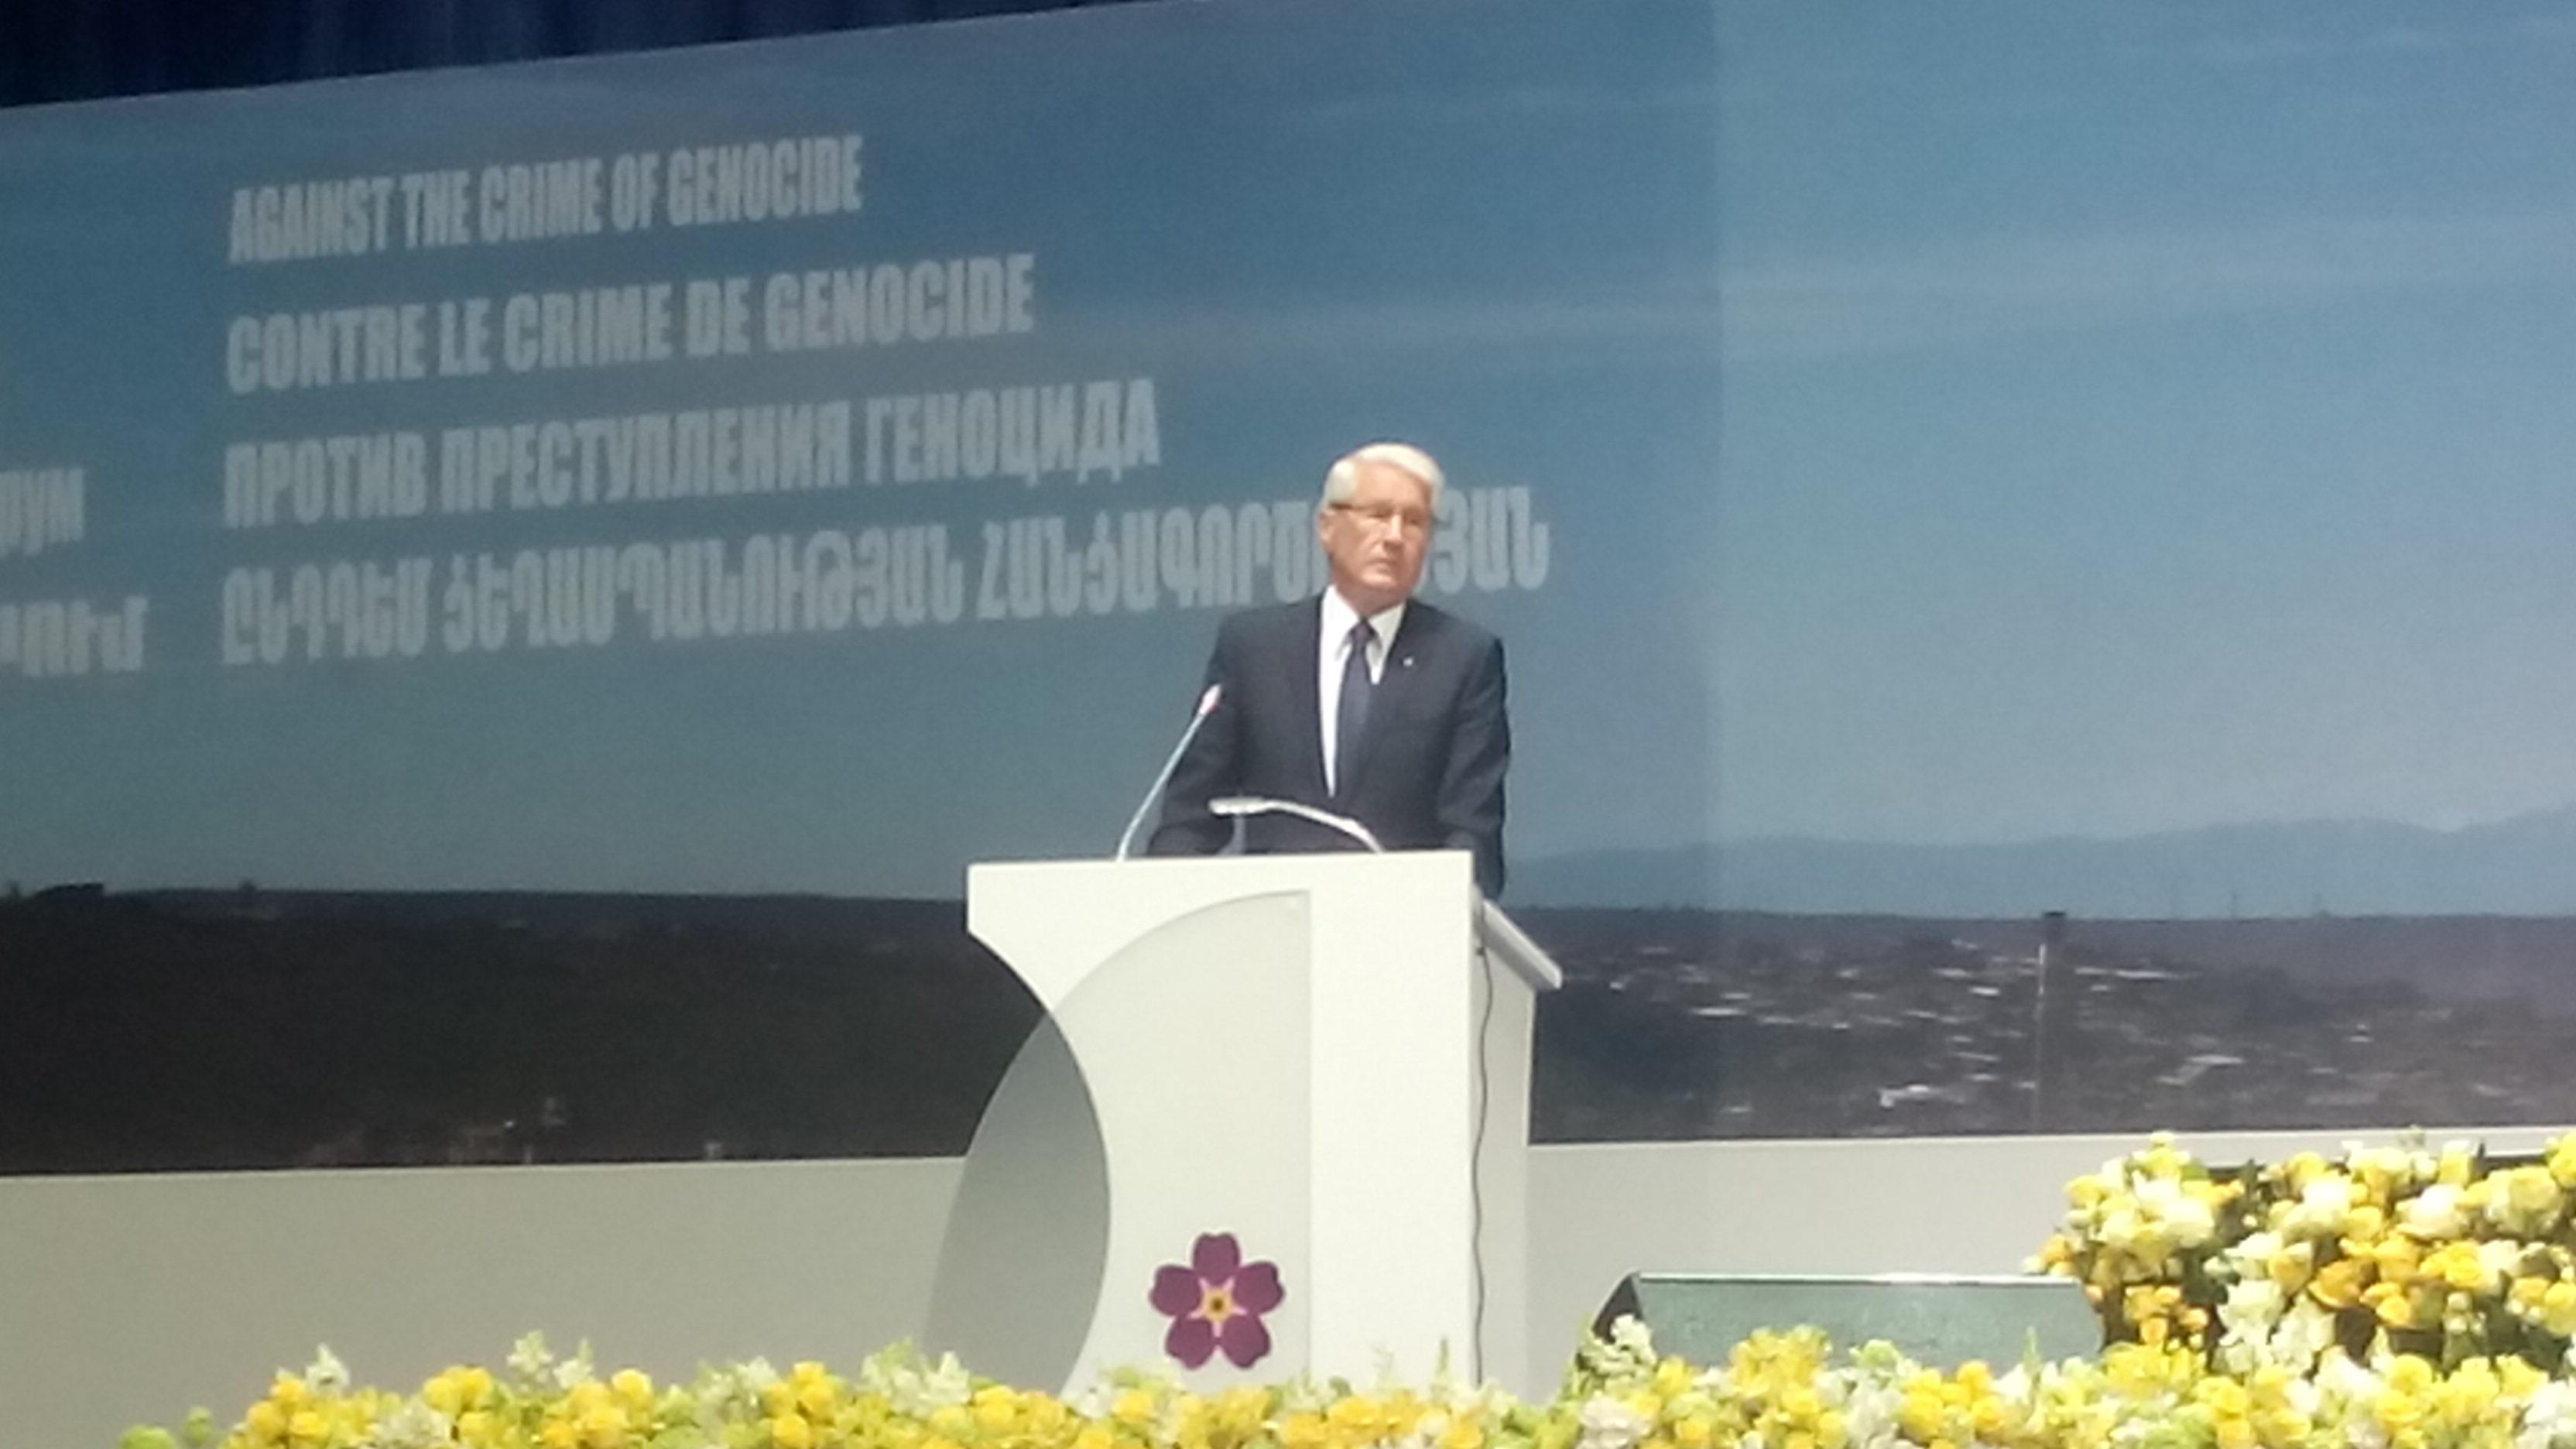 S.E. Präsident Sersh Sargsyan